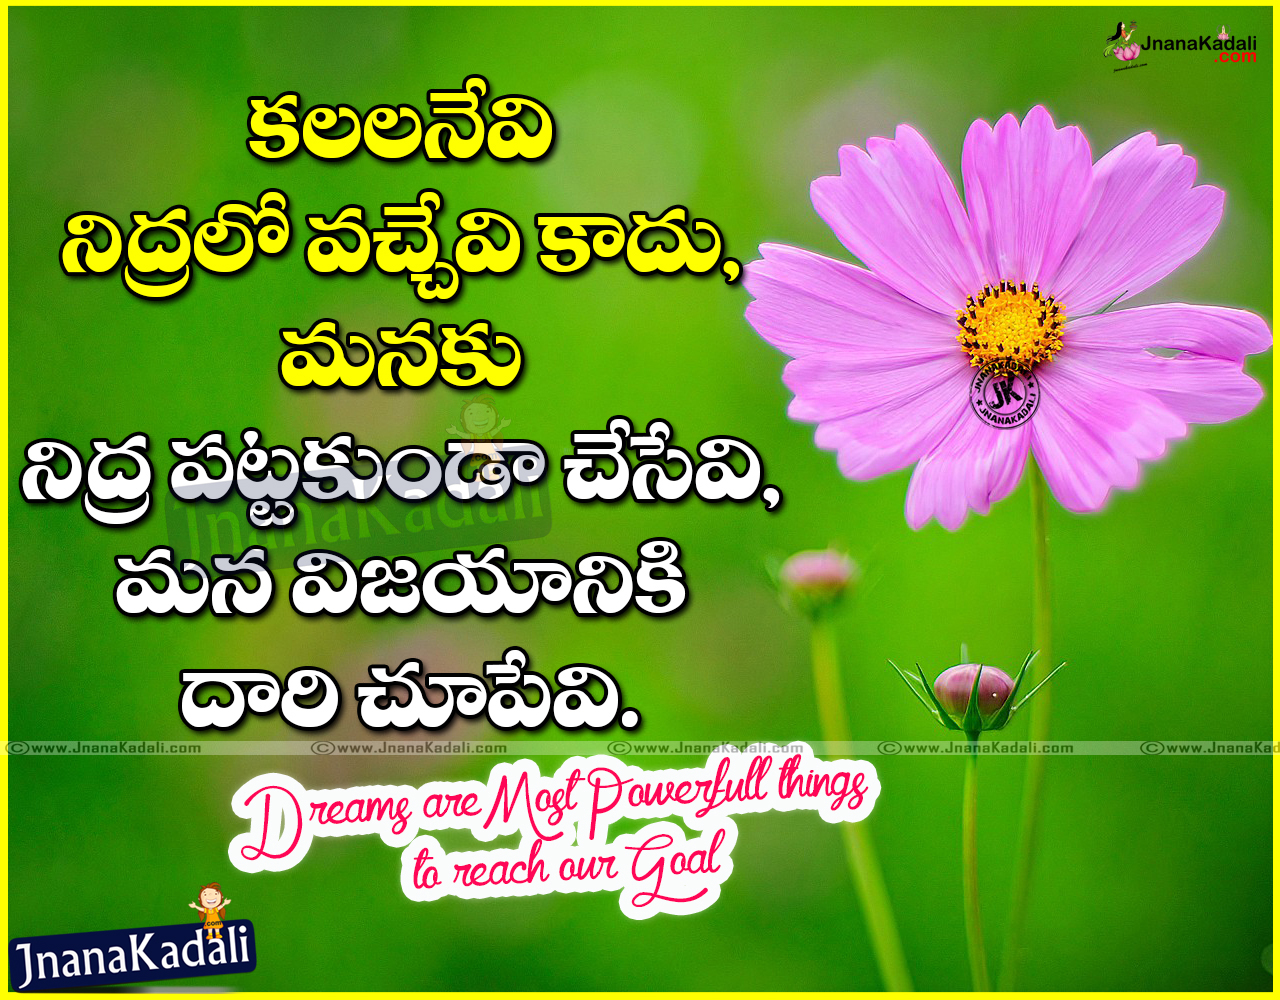 Telugu Motivational Quotes With Hd Wallpapers Jnana Kadali